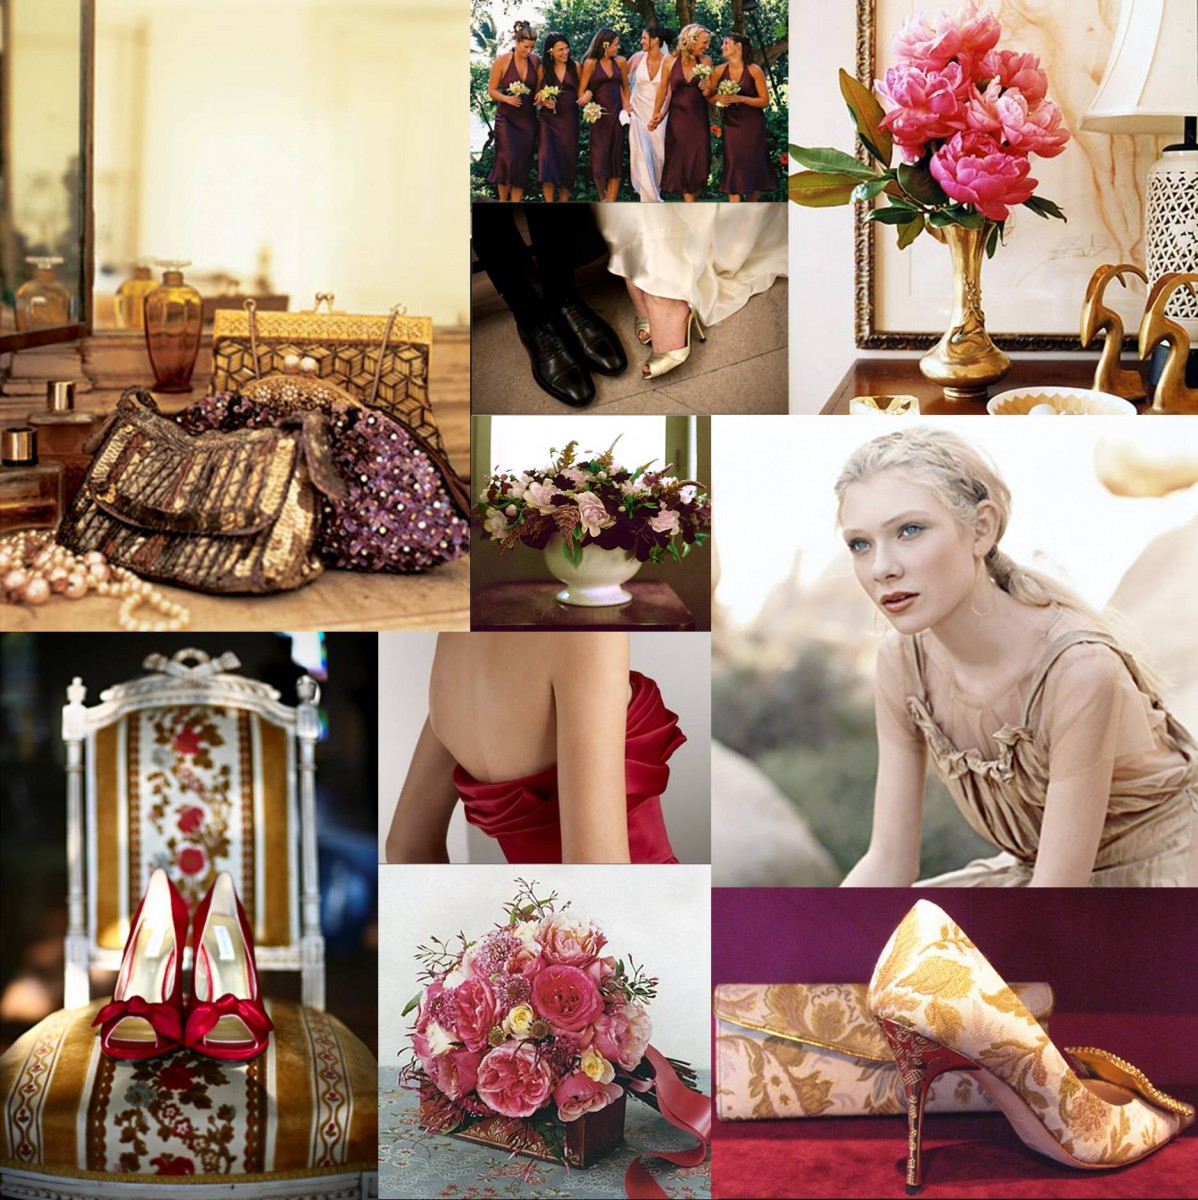 Guam style wedding